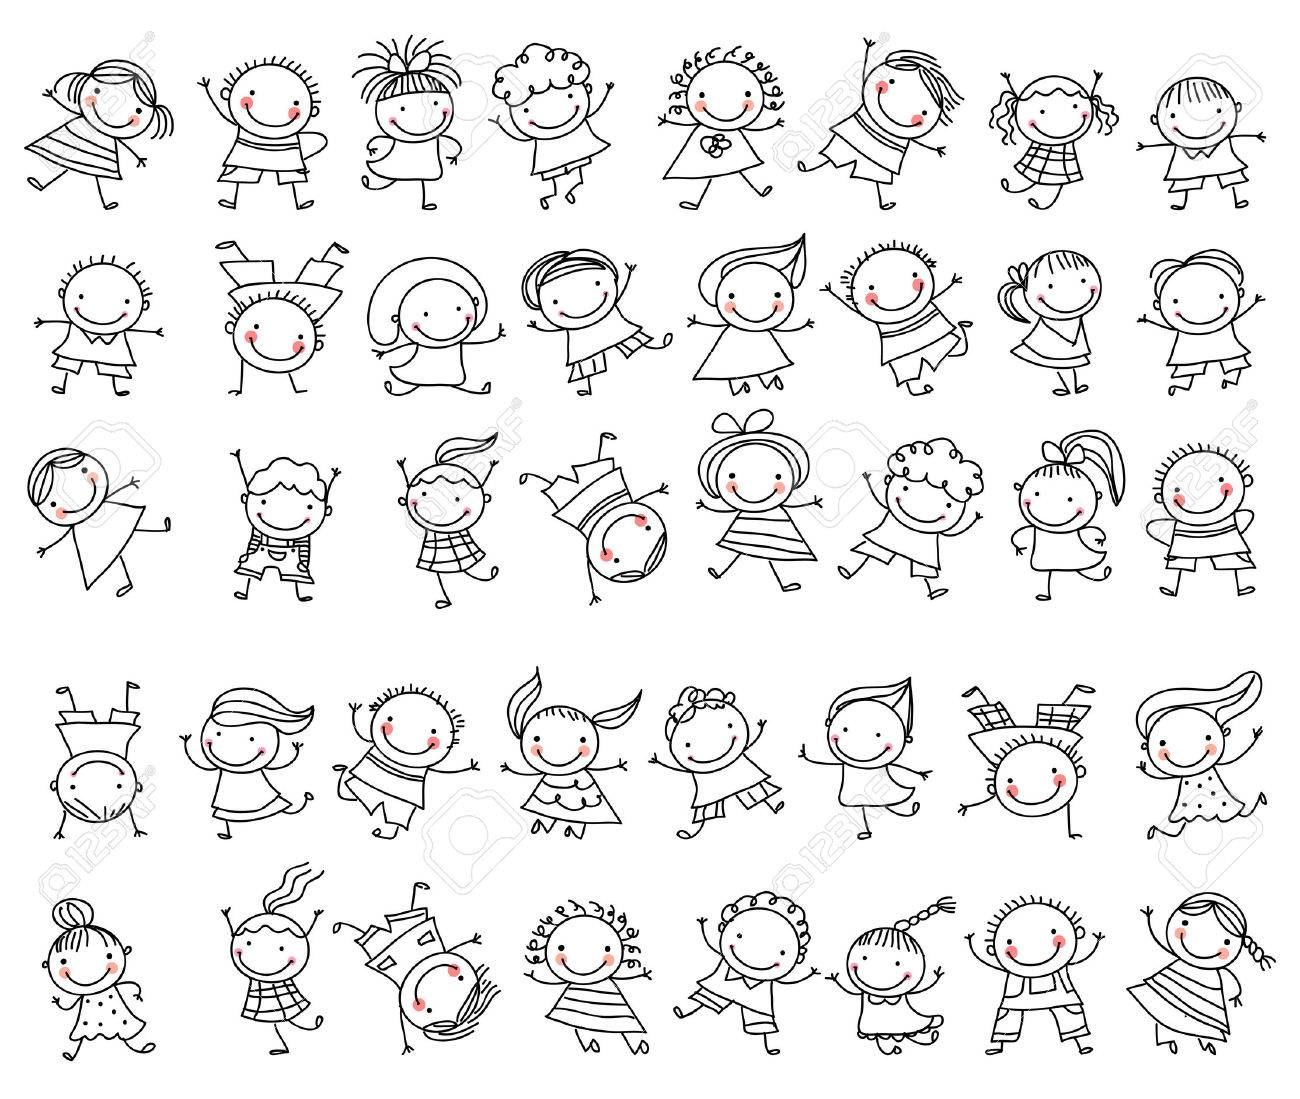 Group of sketch kids - 53259224